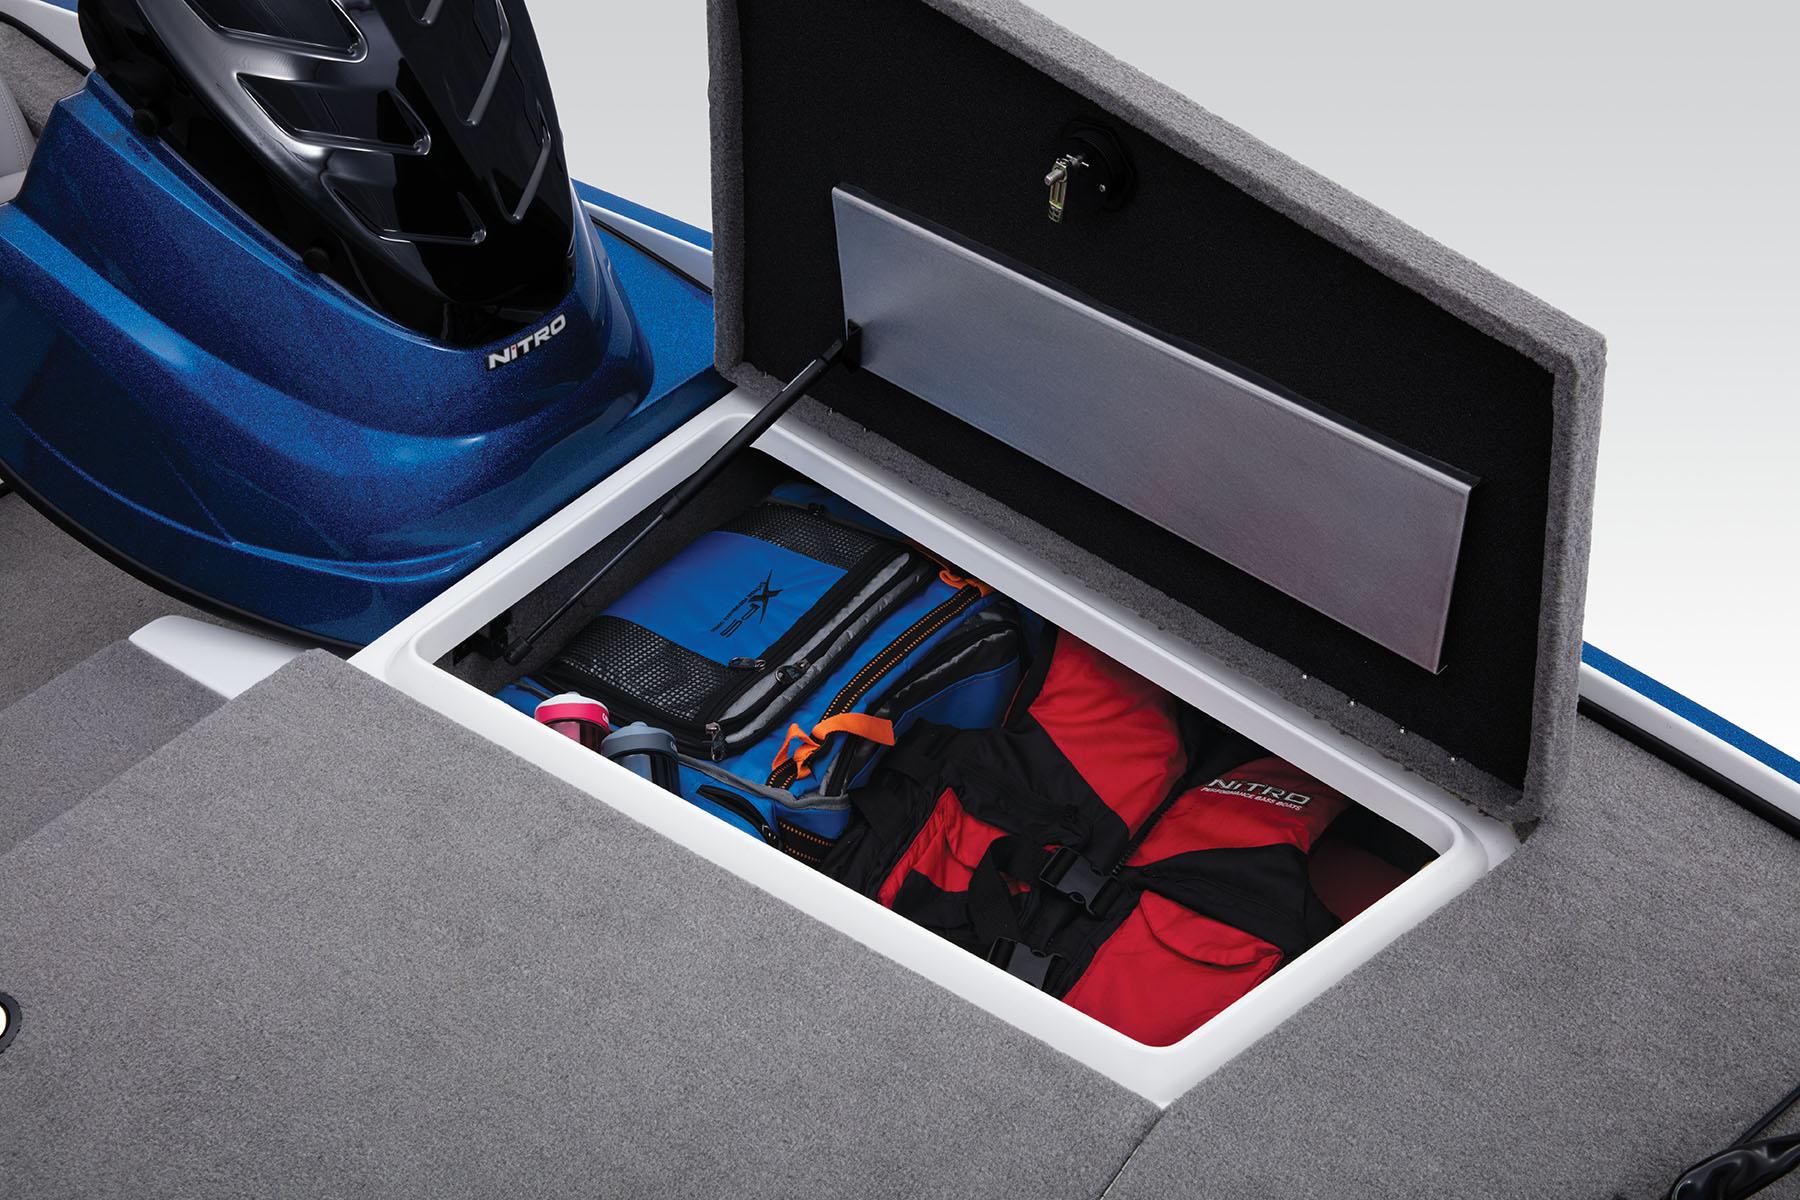 2018 Nitro Z17 Bass Boat Cobalt Fuse Box